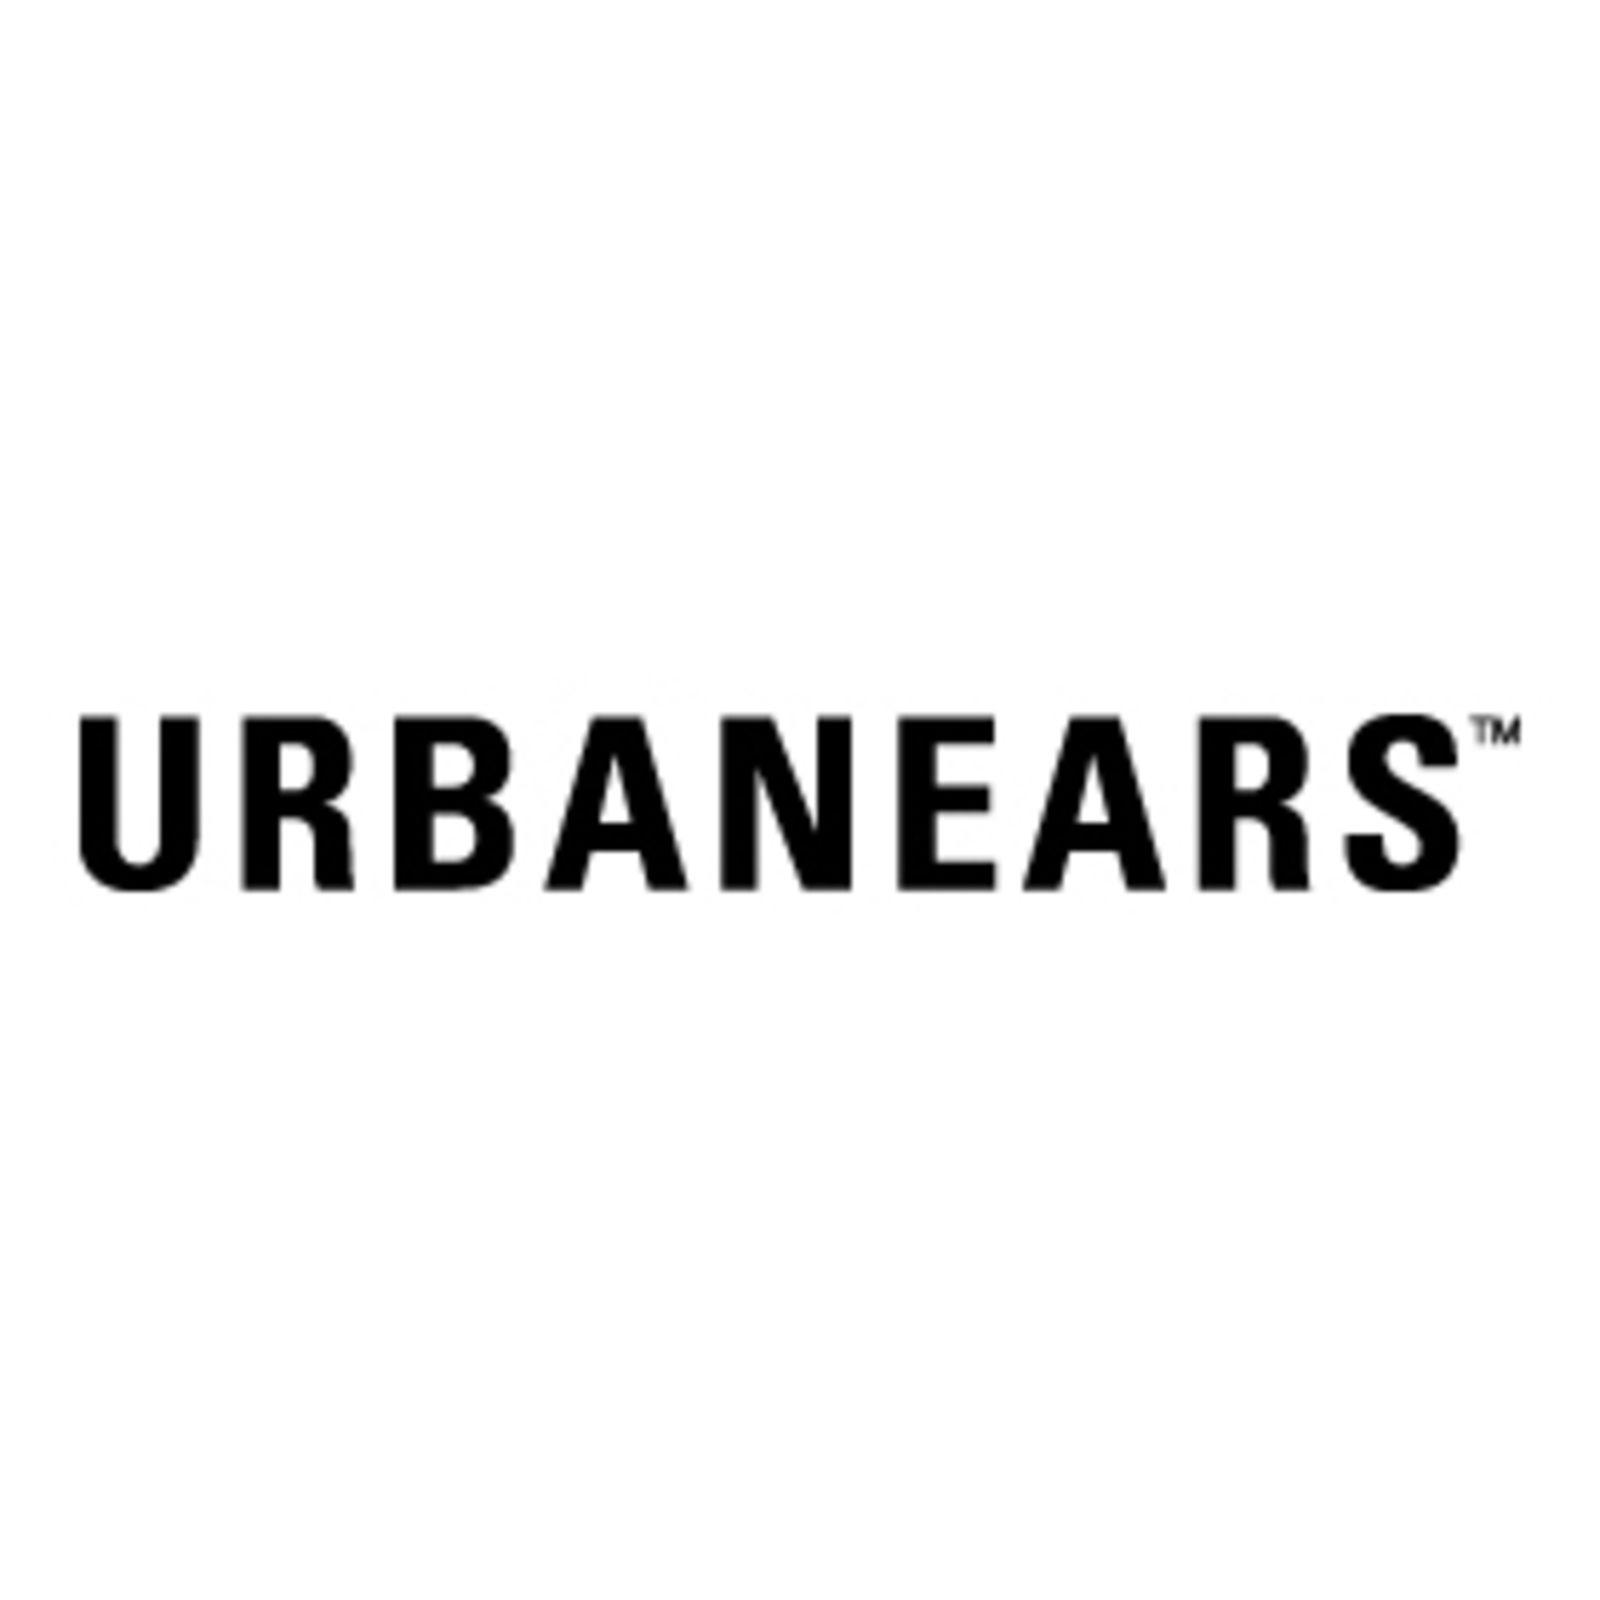 URBANEARS (Image 1)